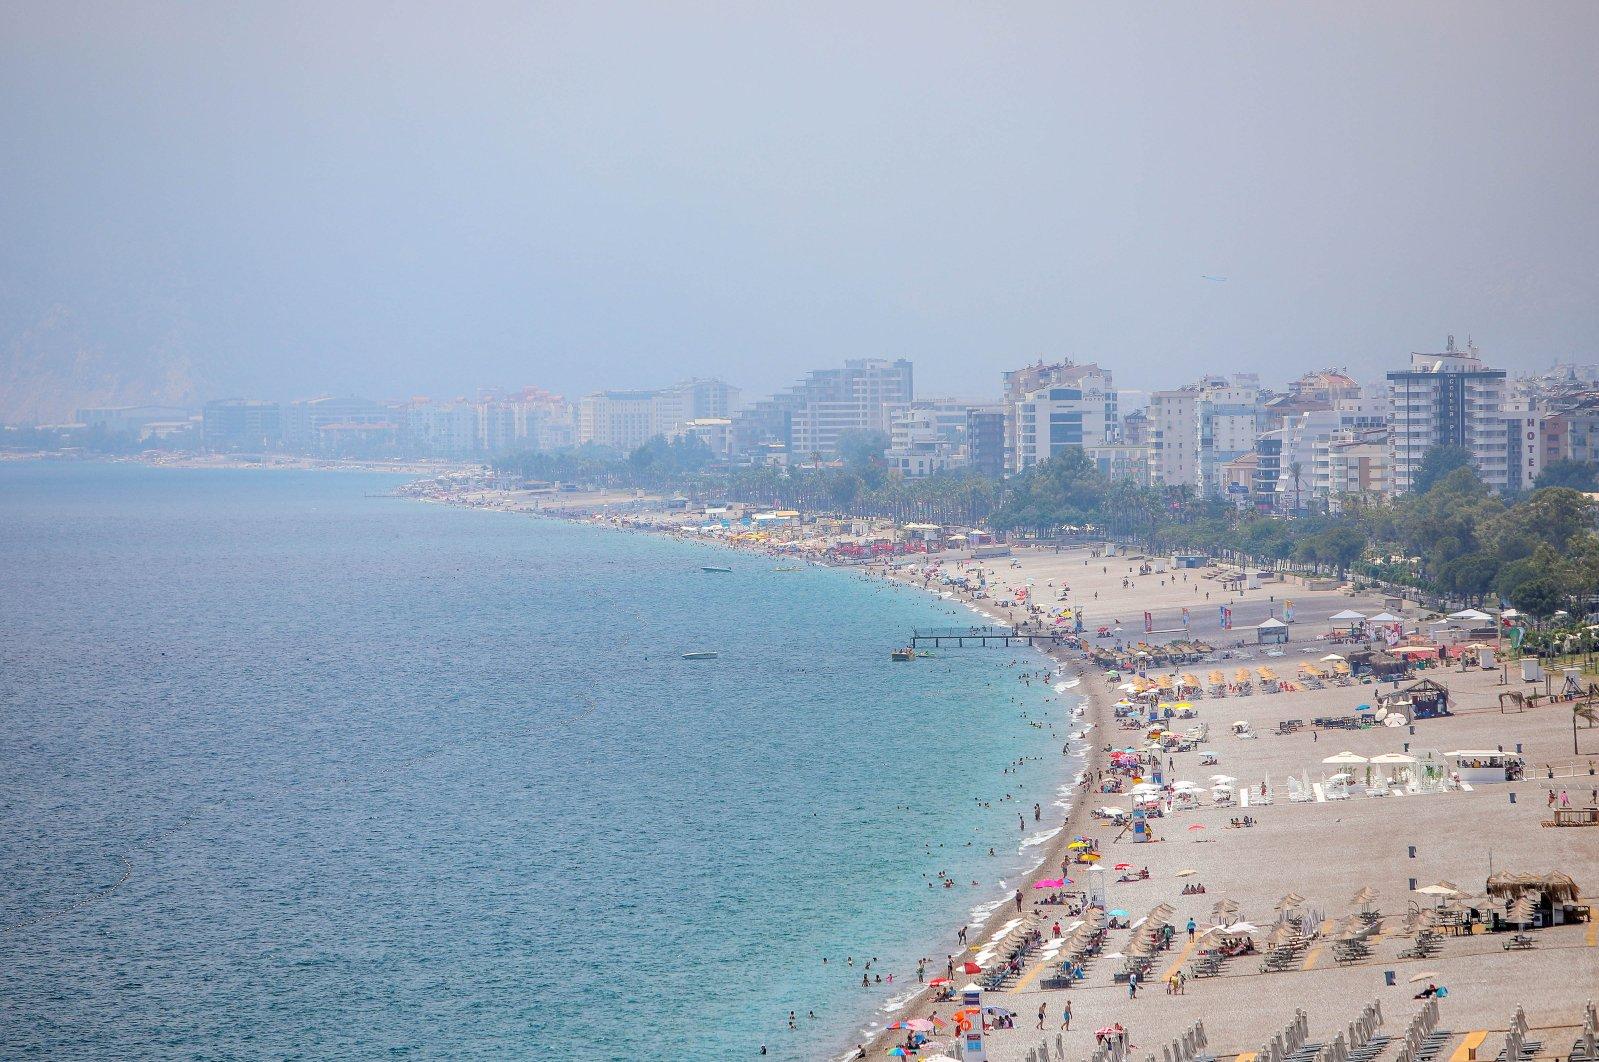 People enjoy the sun at Konyaaltı Beach in Antalya, Turkey, July 6, 2020. (DHA Photo)